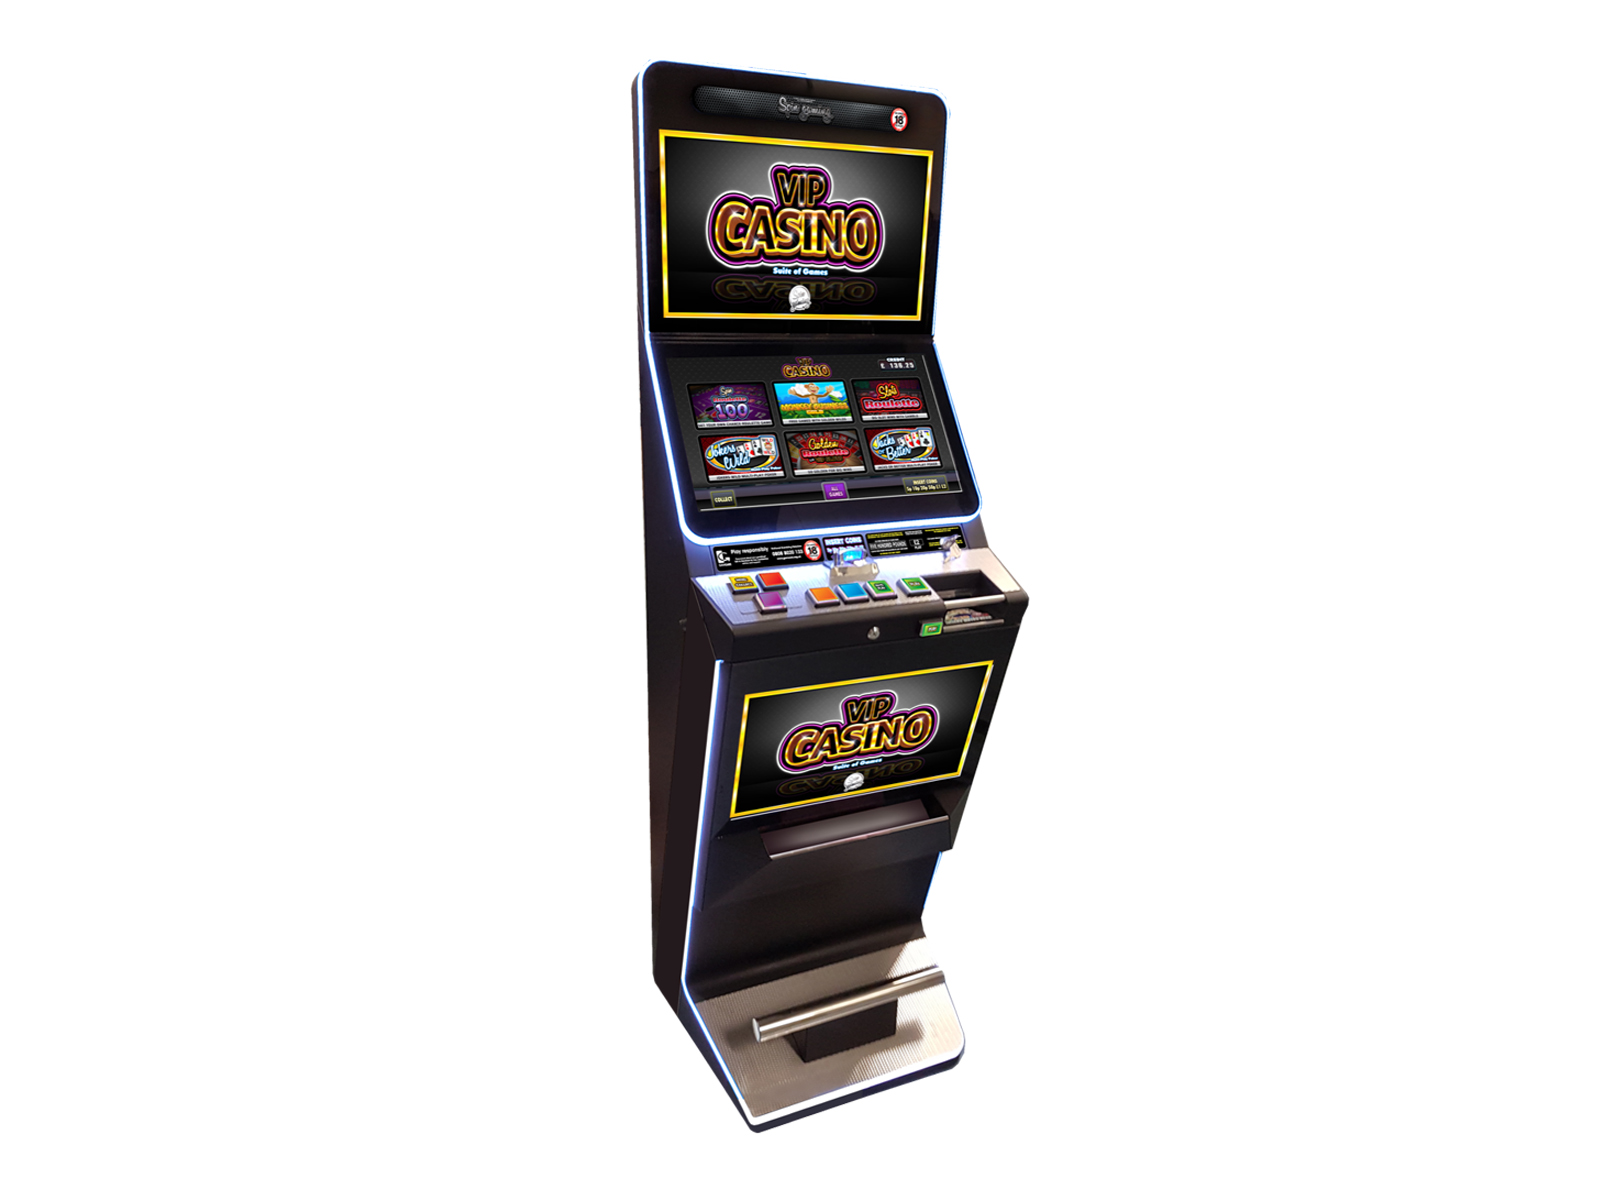 Vip Casino Cat C By Spin Gaming Digital Gaming And Slots Electrocoin